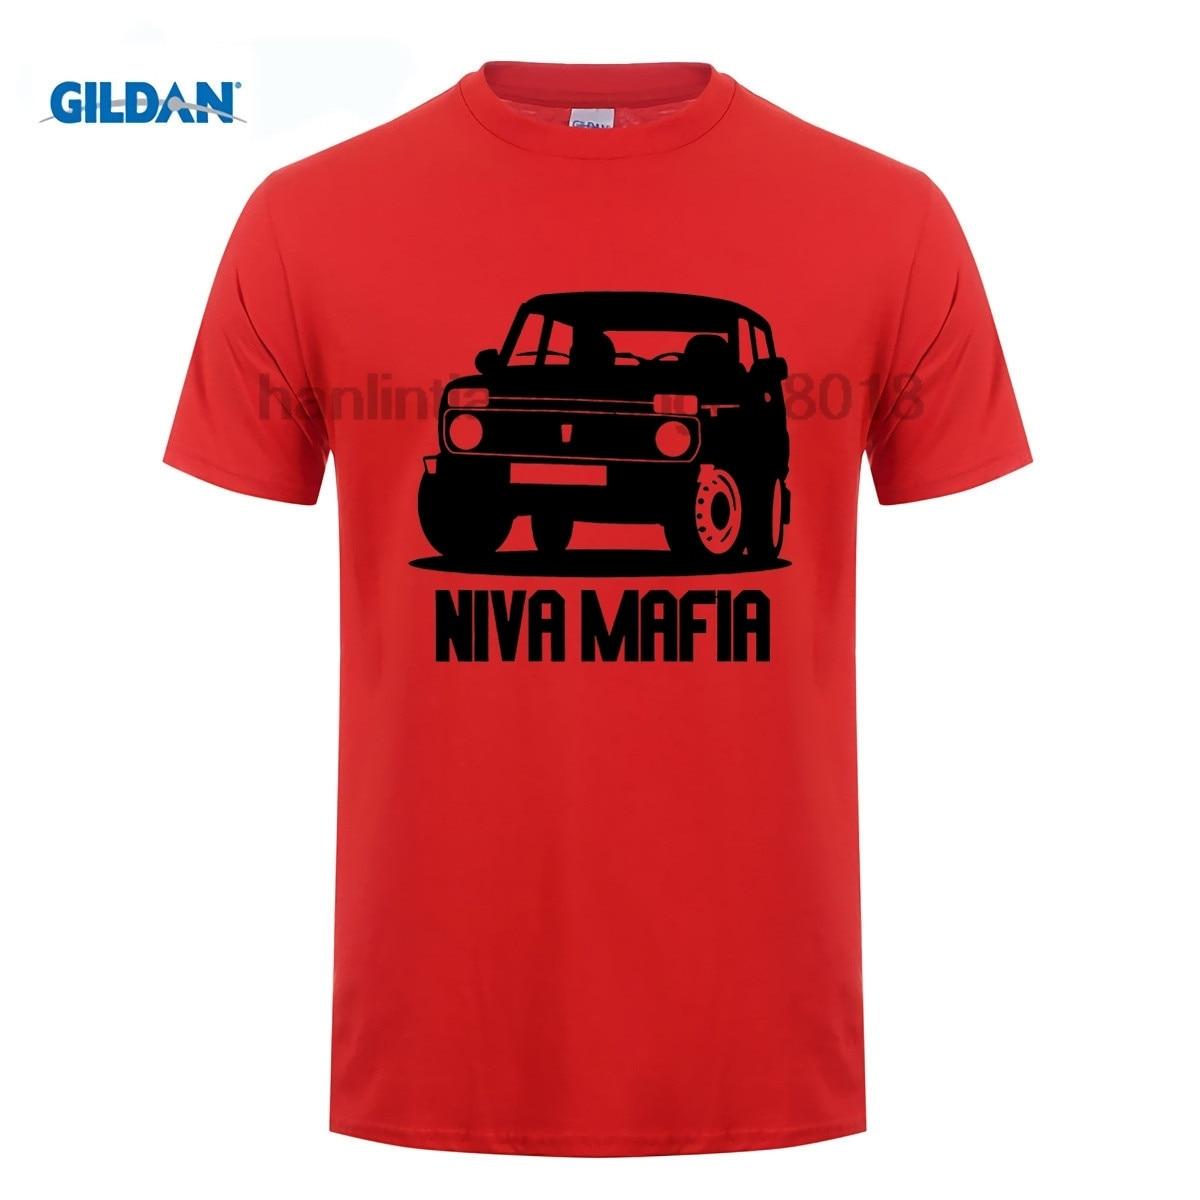 GILDAN Hot Summer Style Brand T Shirt Printing Niva Mafia Offroad Off Road Vehicle Artwork Russia Trucks Oldschool custom in T Shirts from Men 39 s Clothing